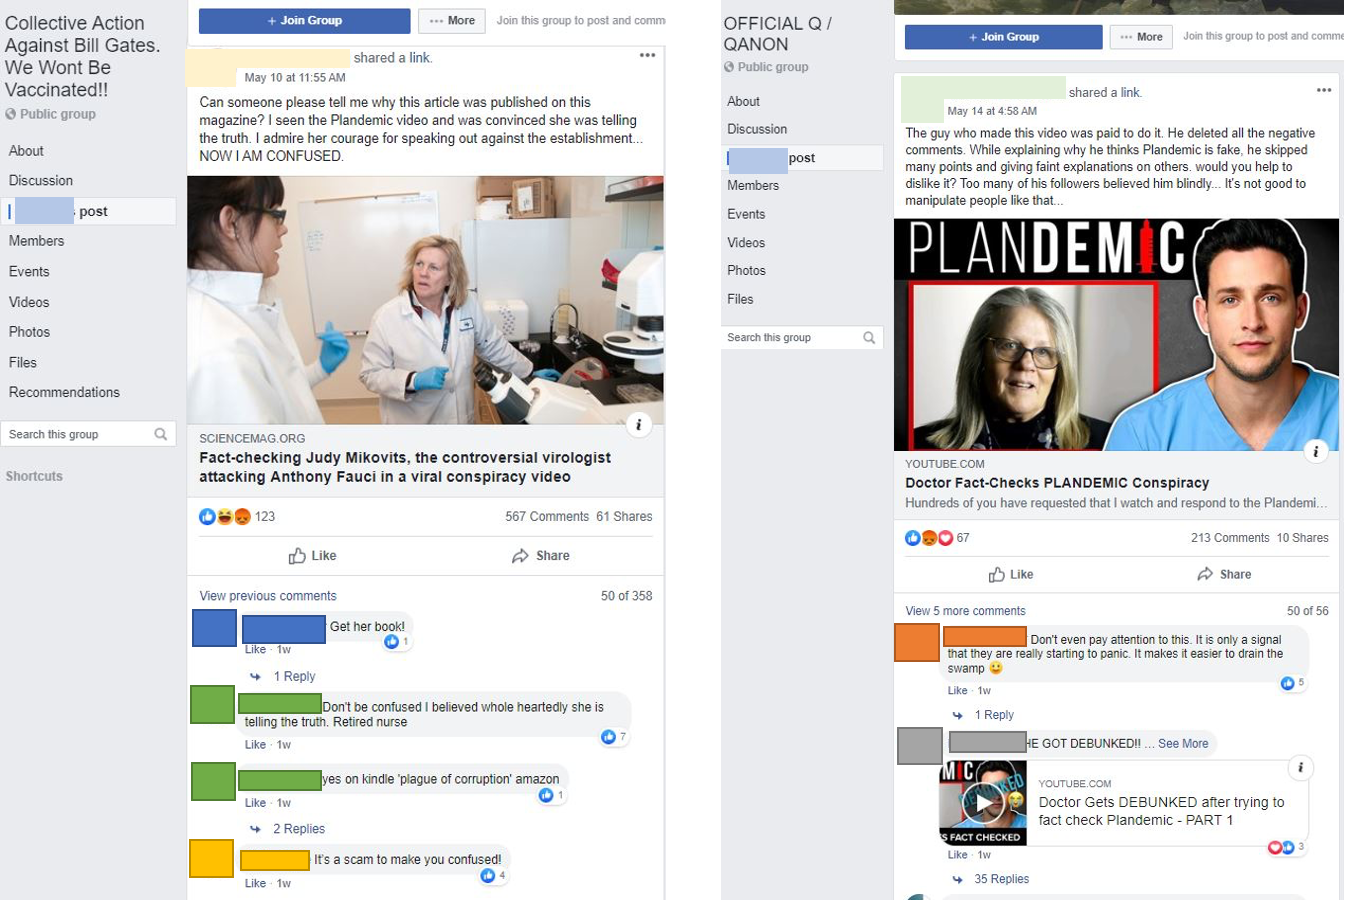 Fsi Virality Project Us Marketing Meets Misinformation